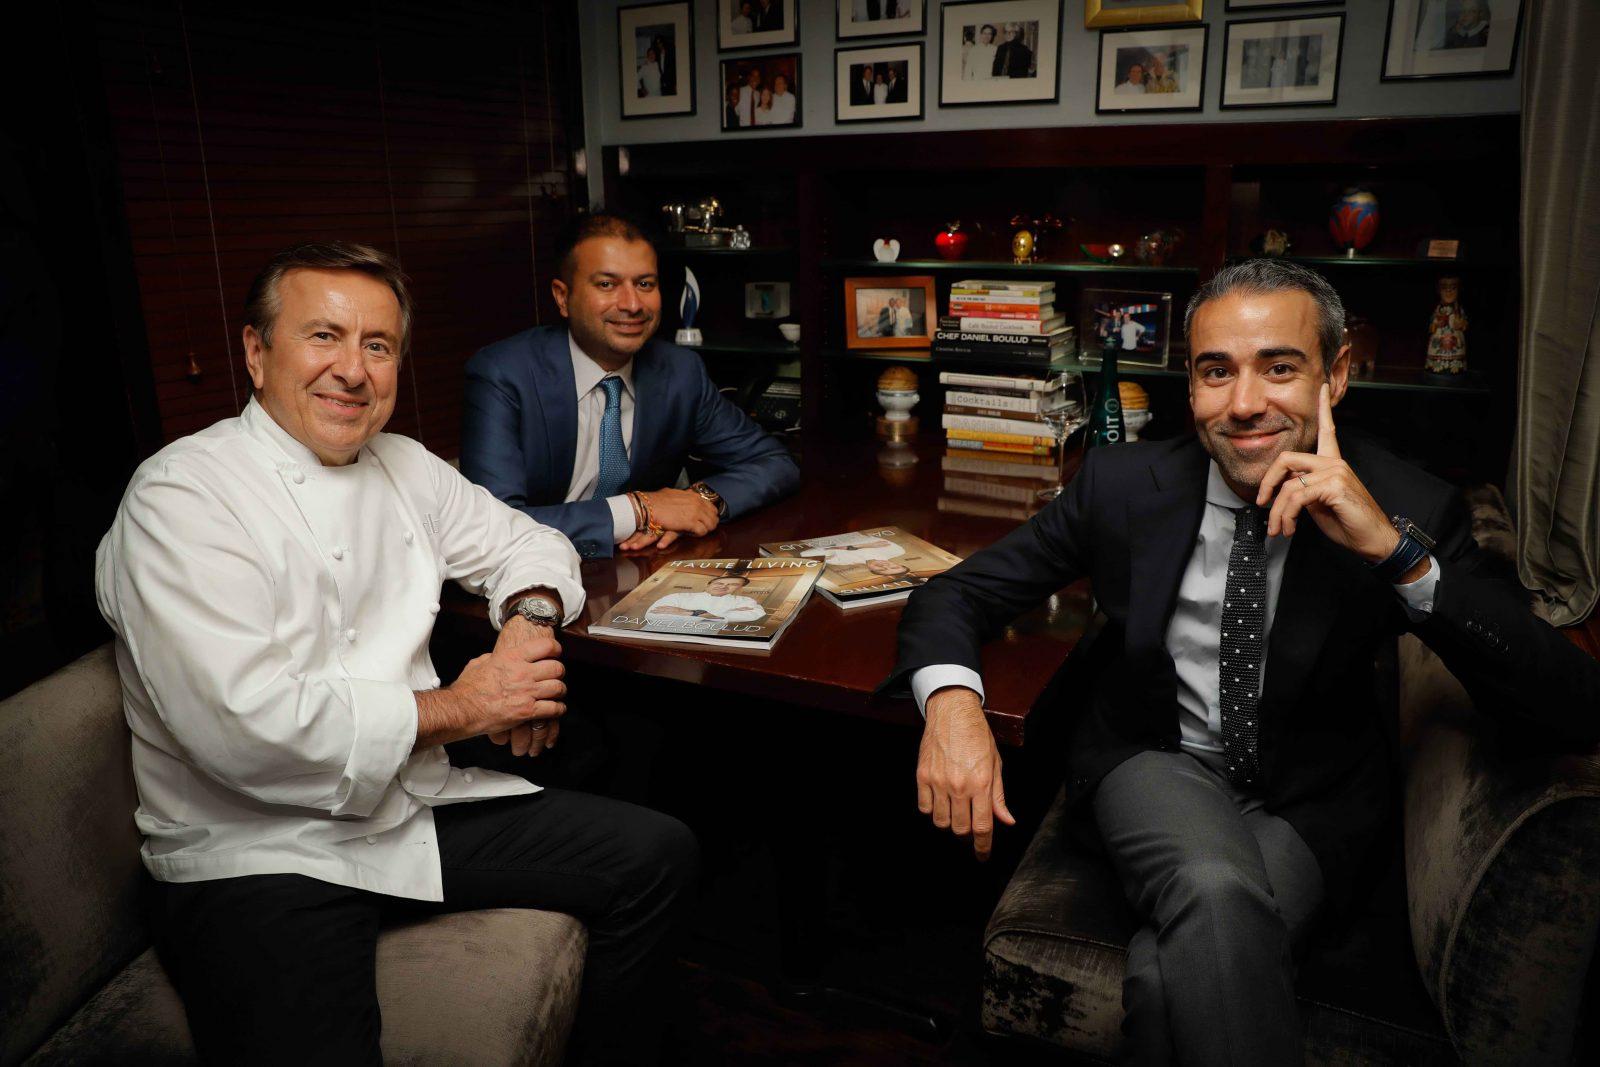 Chef Daniel Boulud, Kamal Hotchandani and Jean-François Sberro